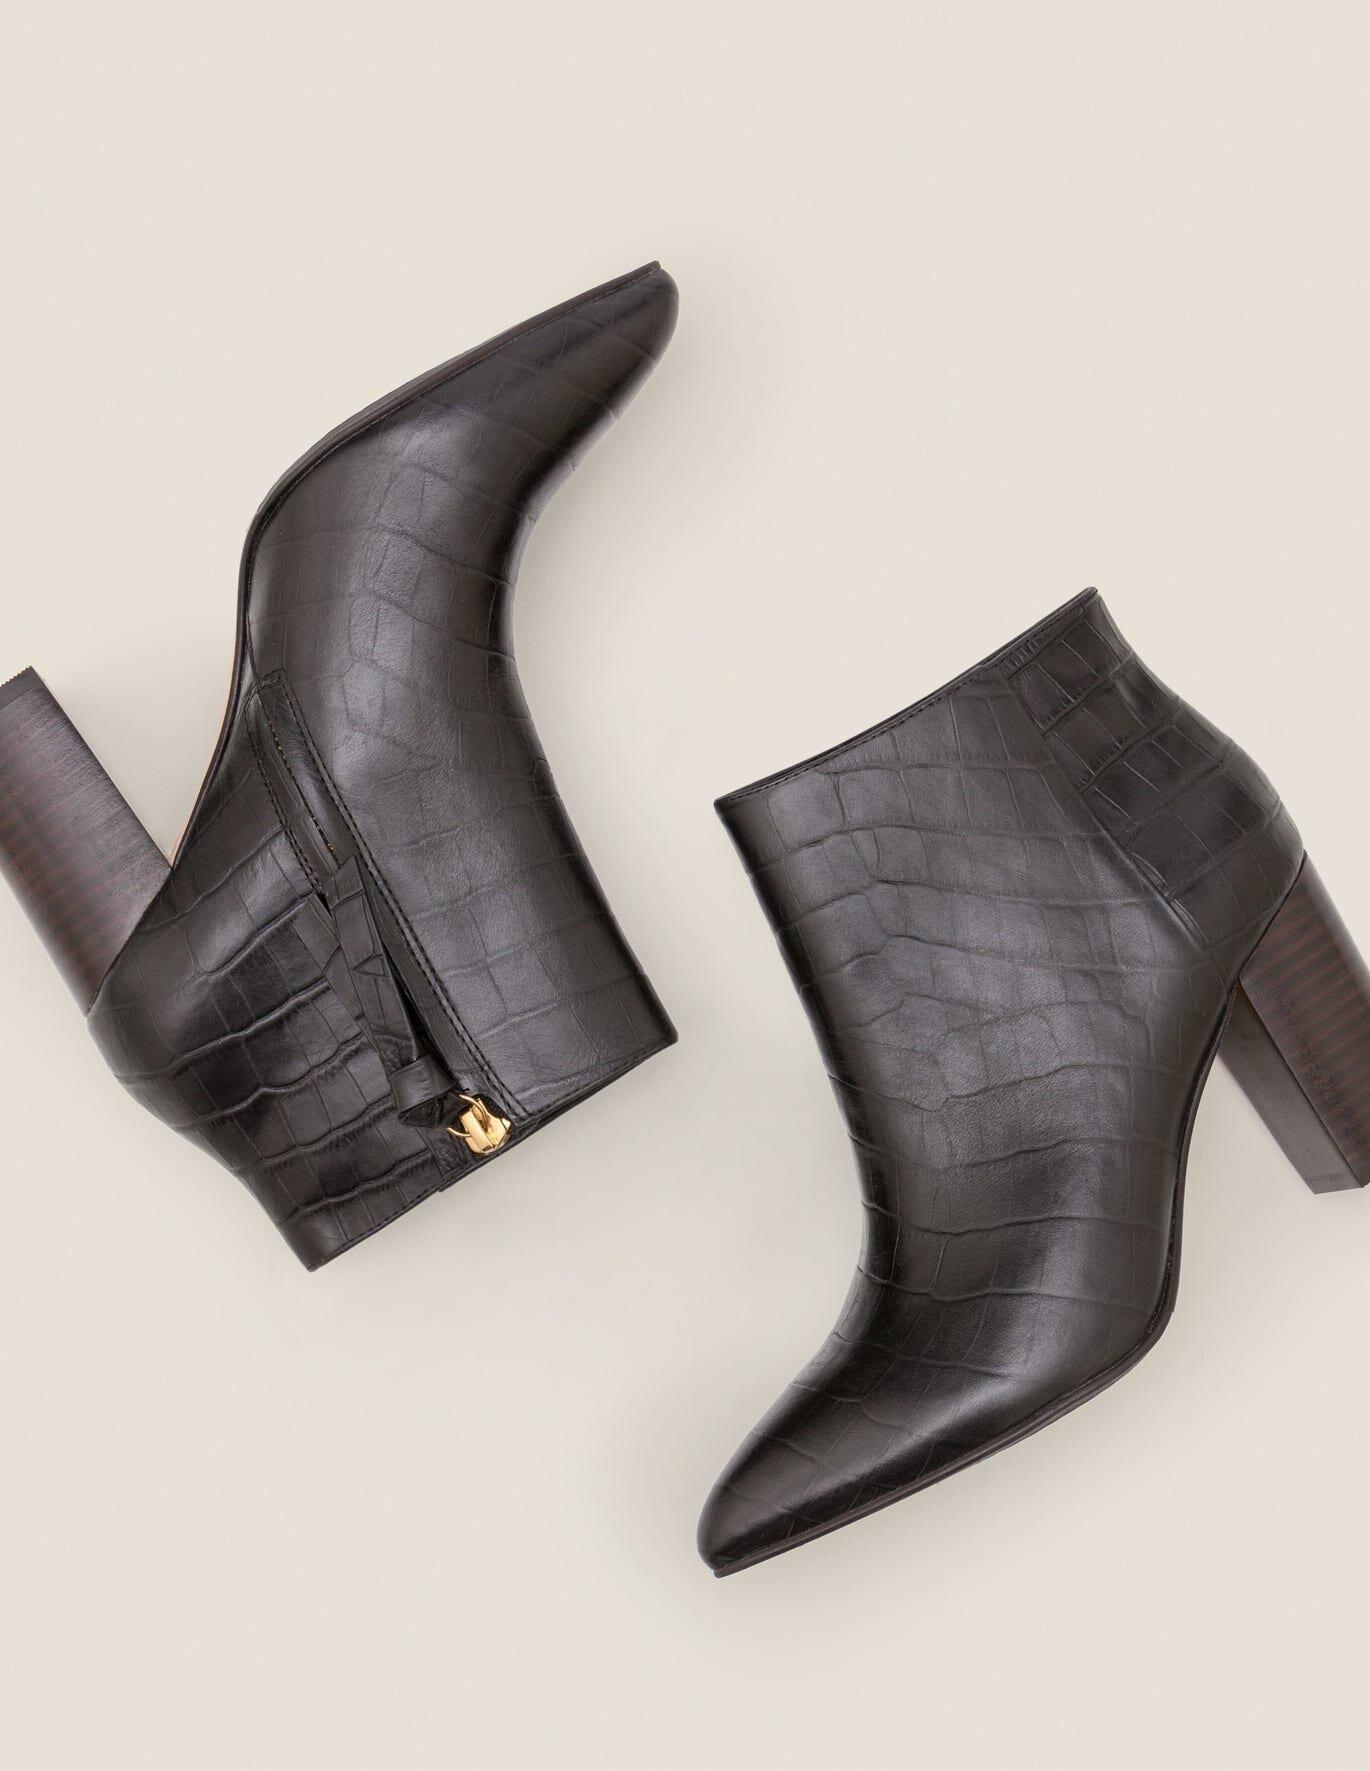 LANGLEY ANKLE BOOTS - BLACK CROC